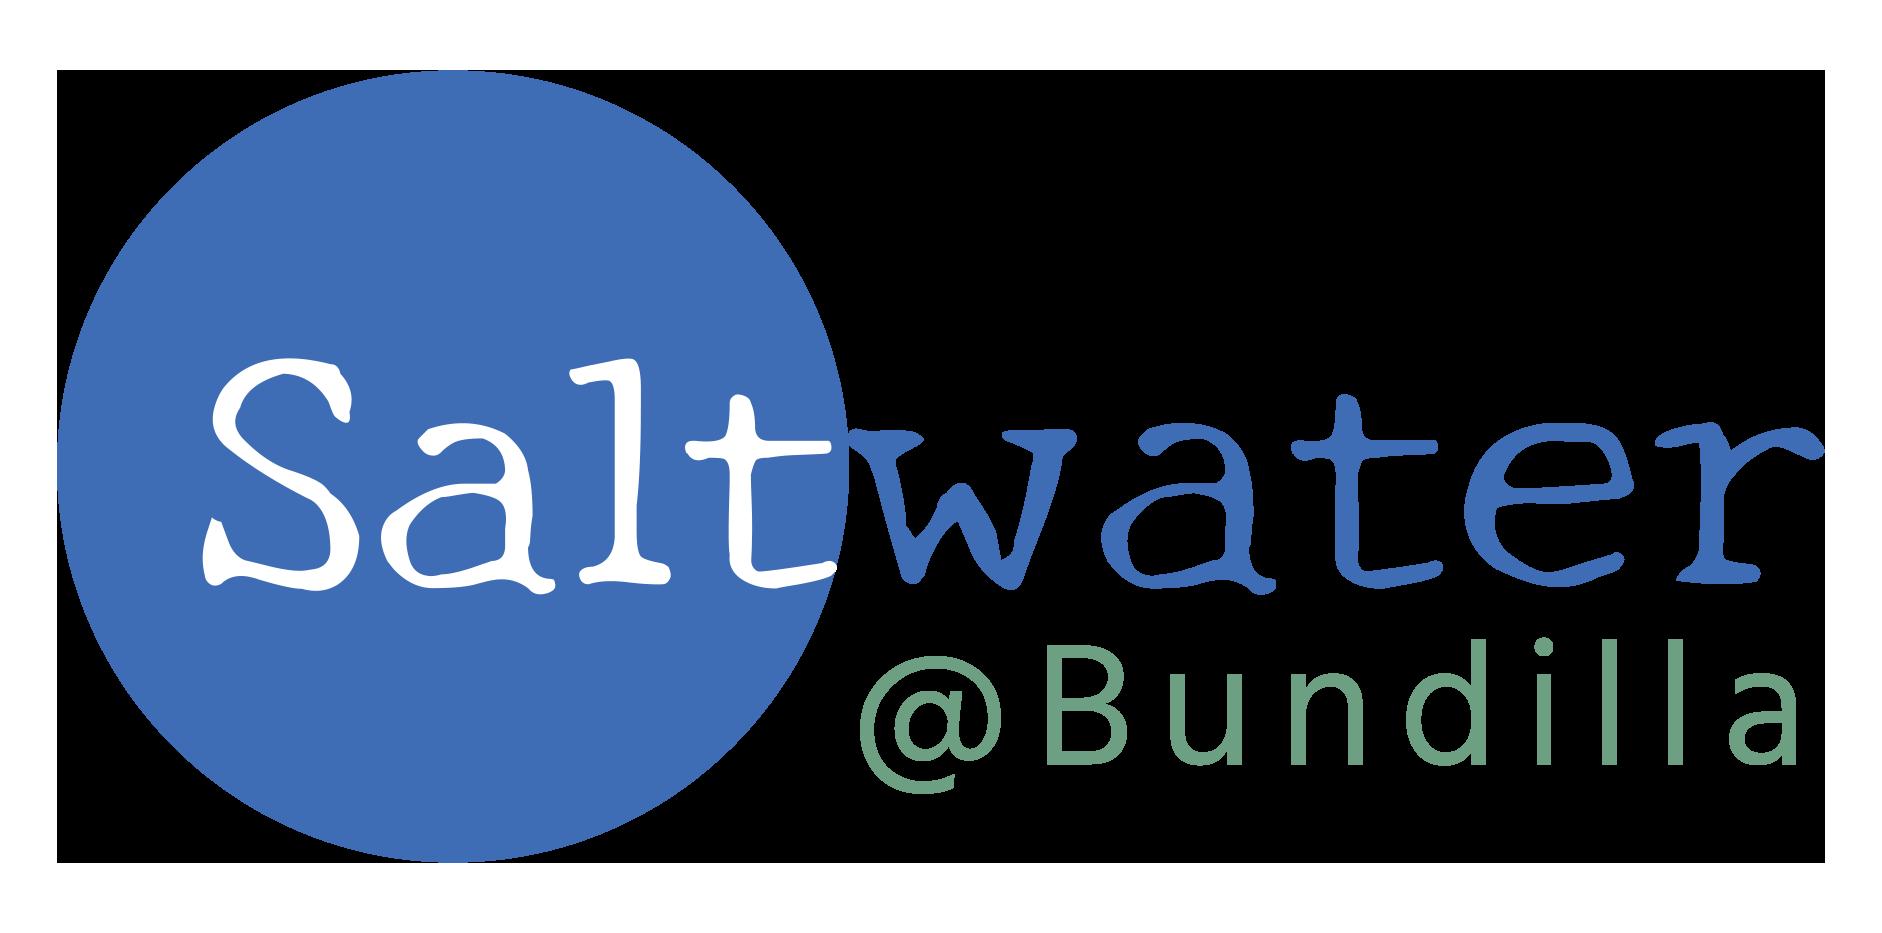 Saltwater @ Bundilla